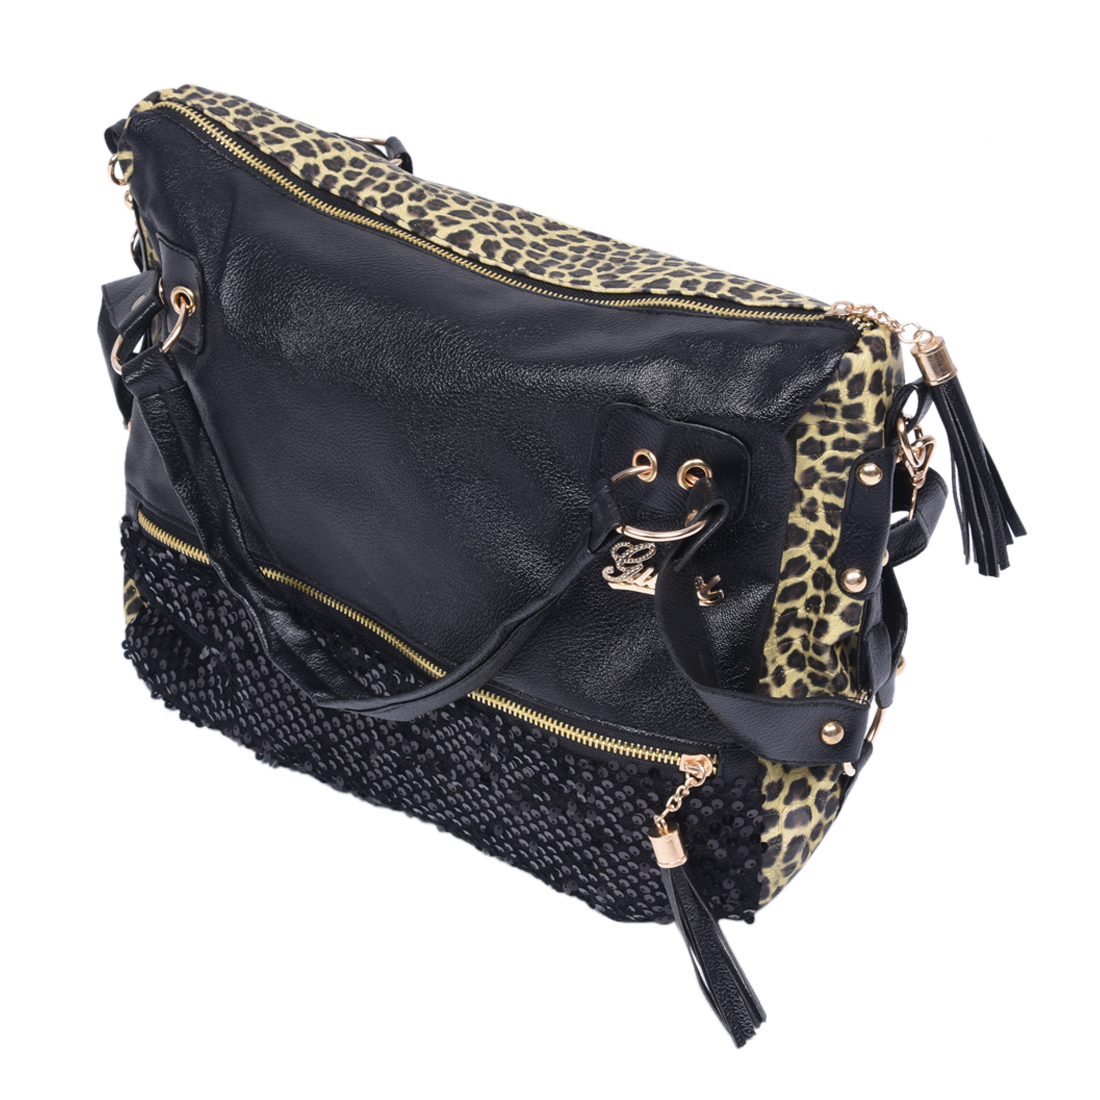 10pcs( ASDS Women Handbag Shoulder Bag Tote Purse PU Leather Women Messenger Hobo Bag women s fashion pu leather messenger hobo handbag purse shoulder bag purse lady tote black